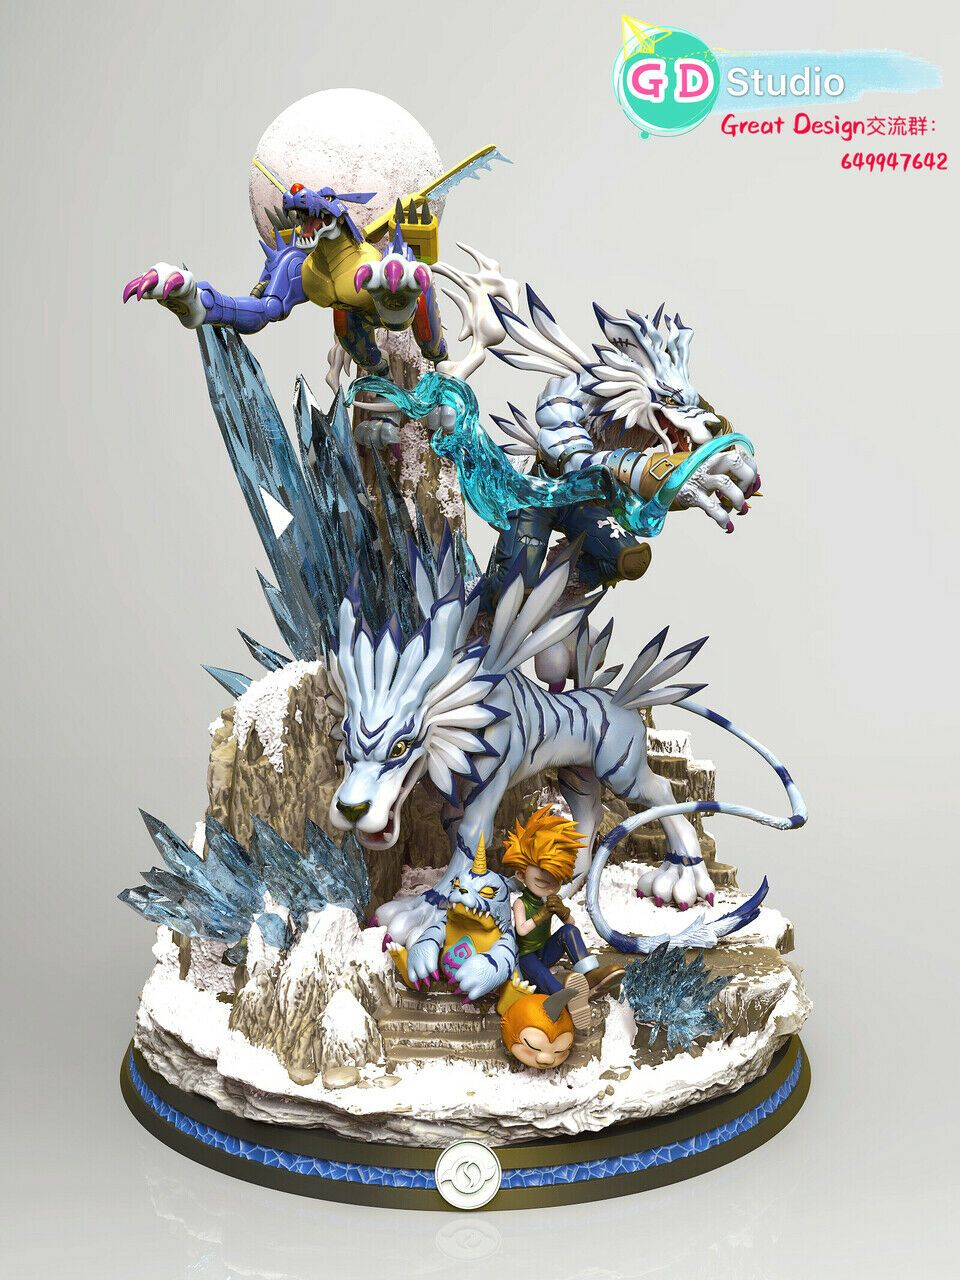 Digital Monster Great Design Studio Digimon Garurumon Resin Statue